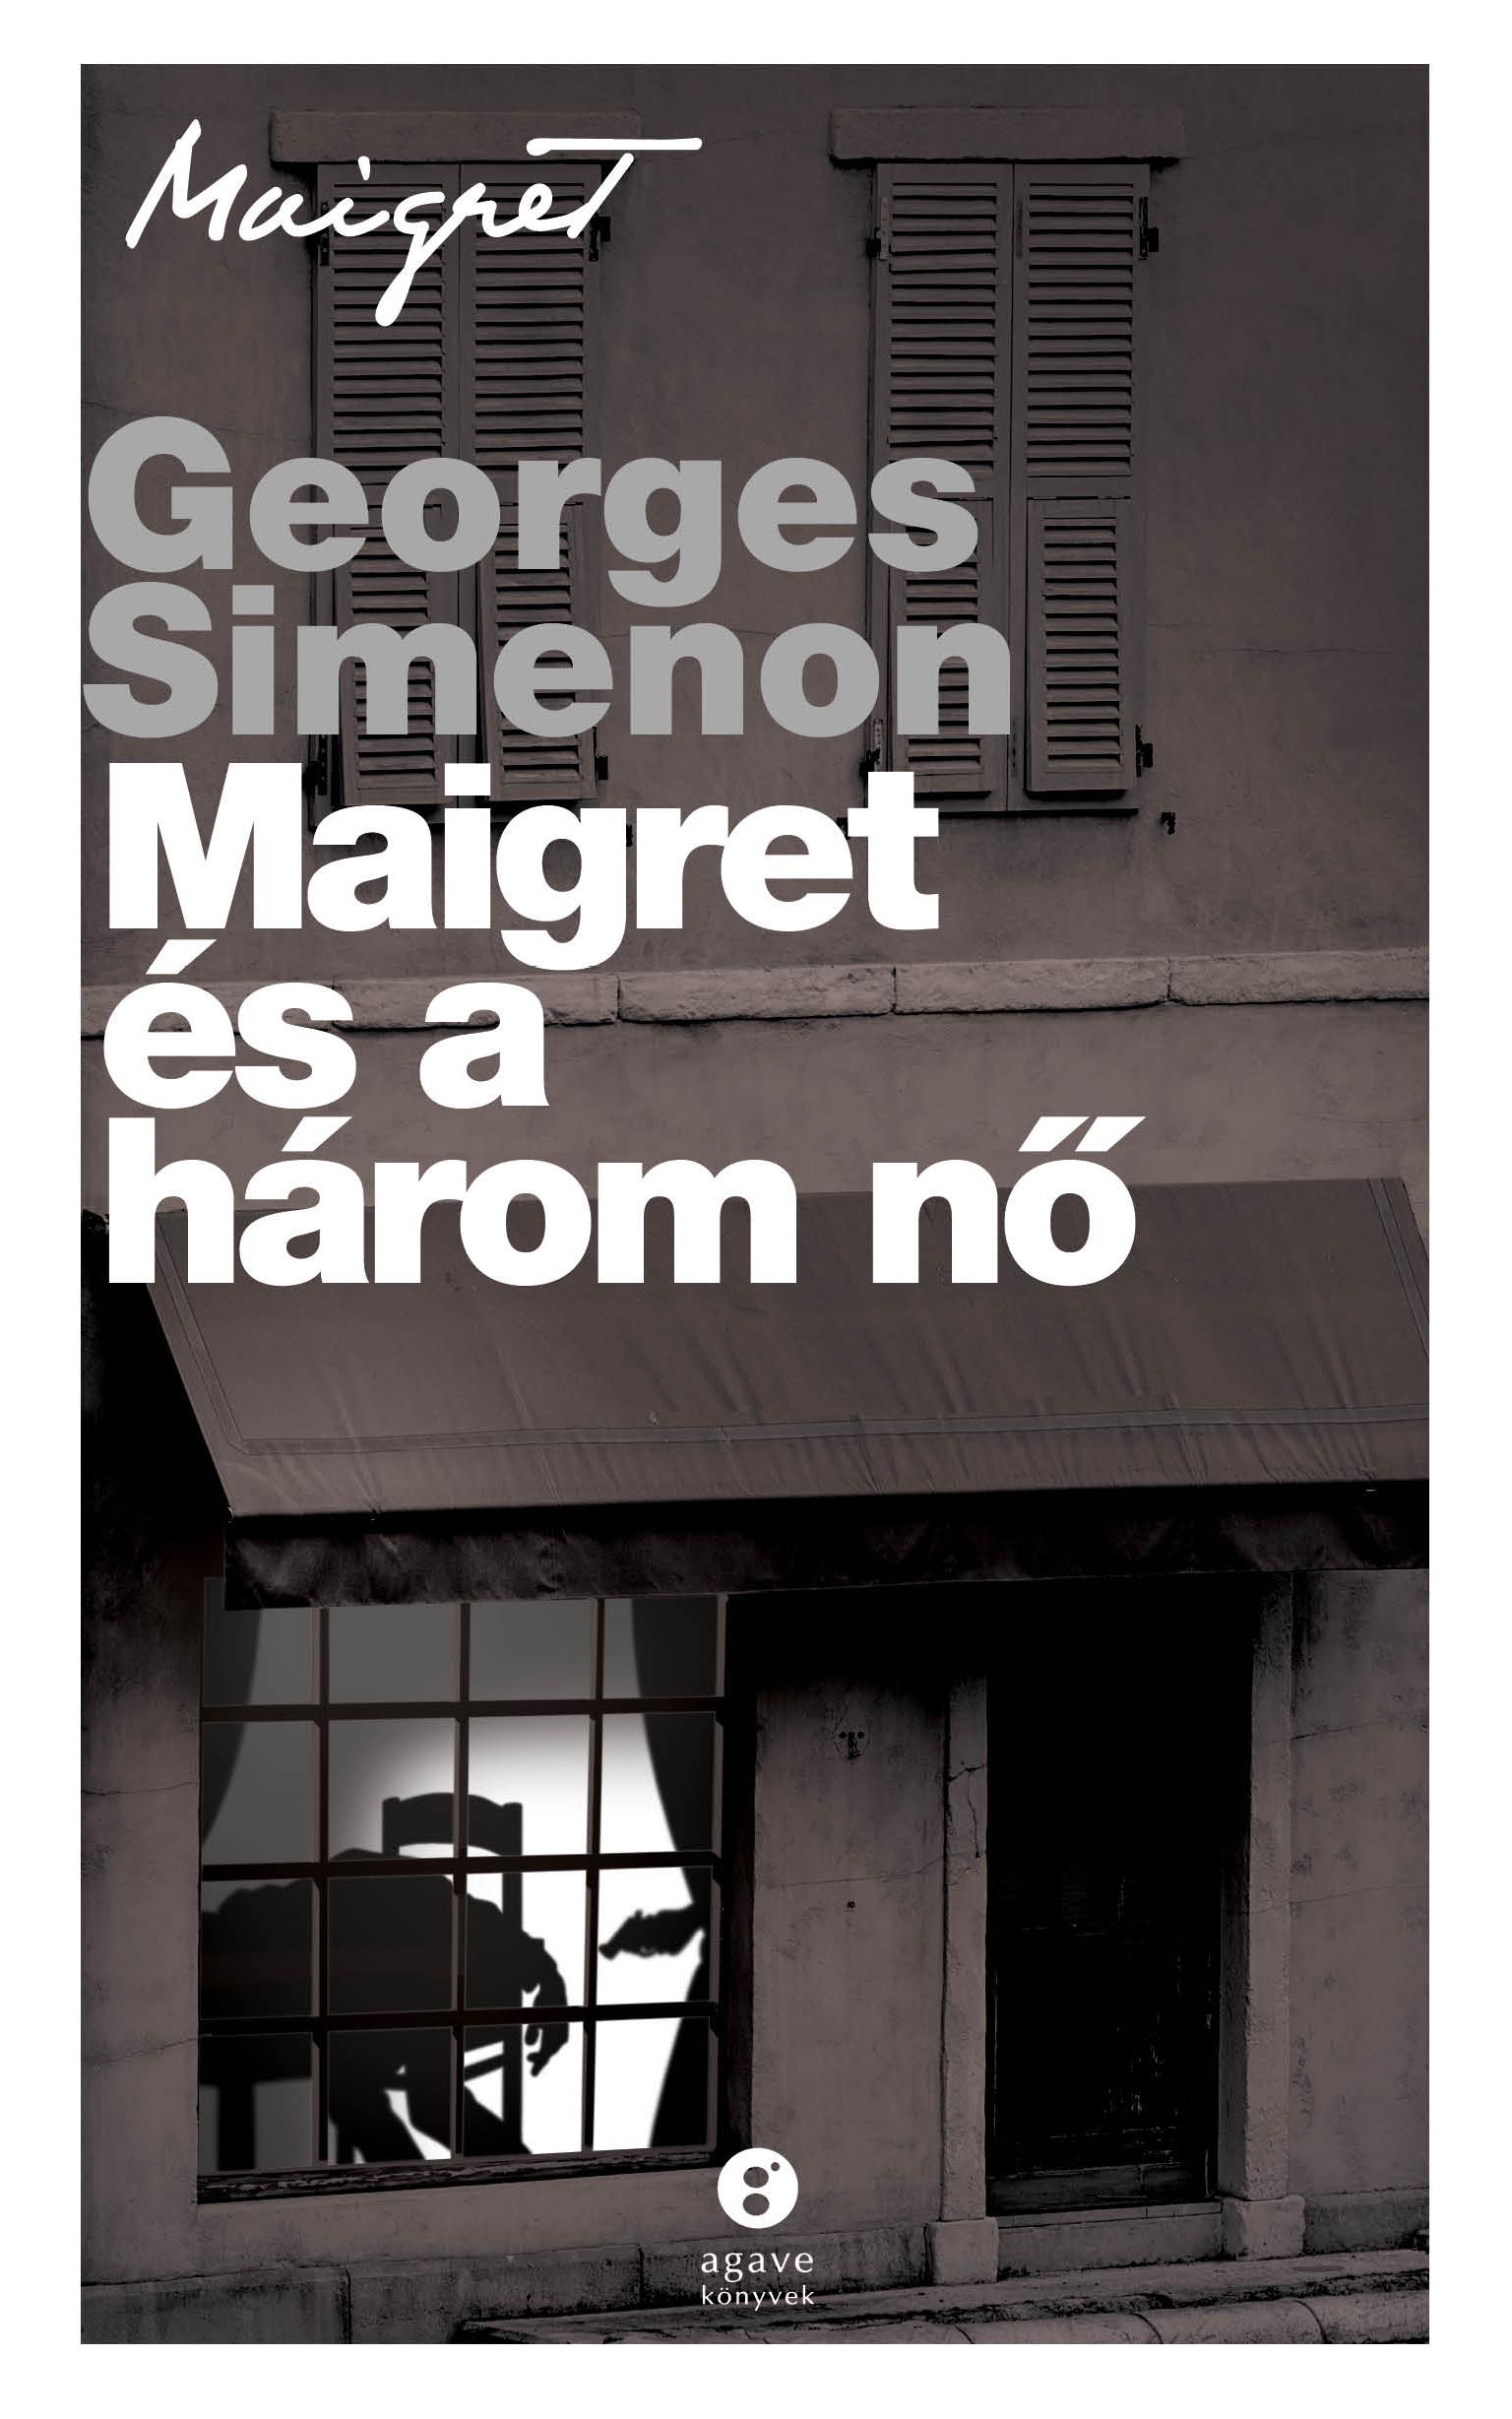 Georges_Simenon_Maigret_es_a_harom_no_b1_300dpi.jpg